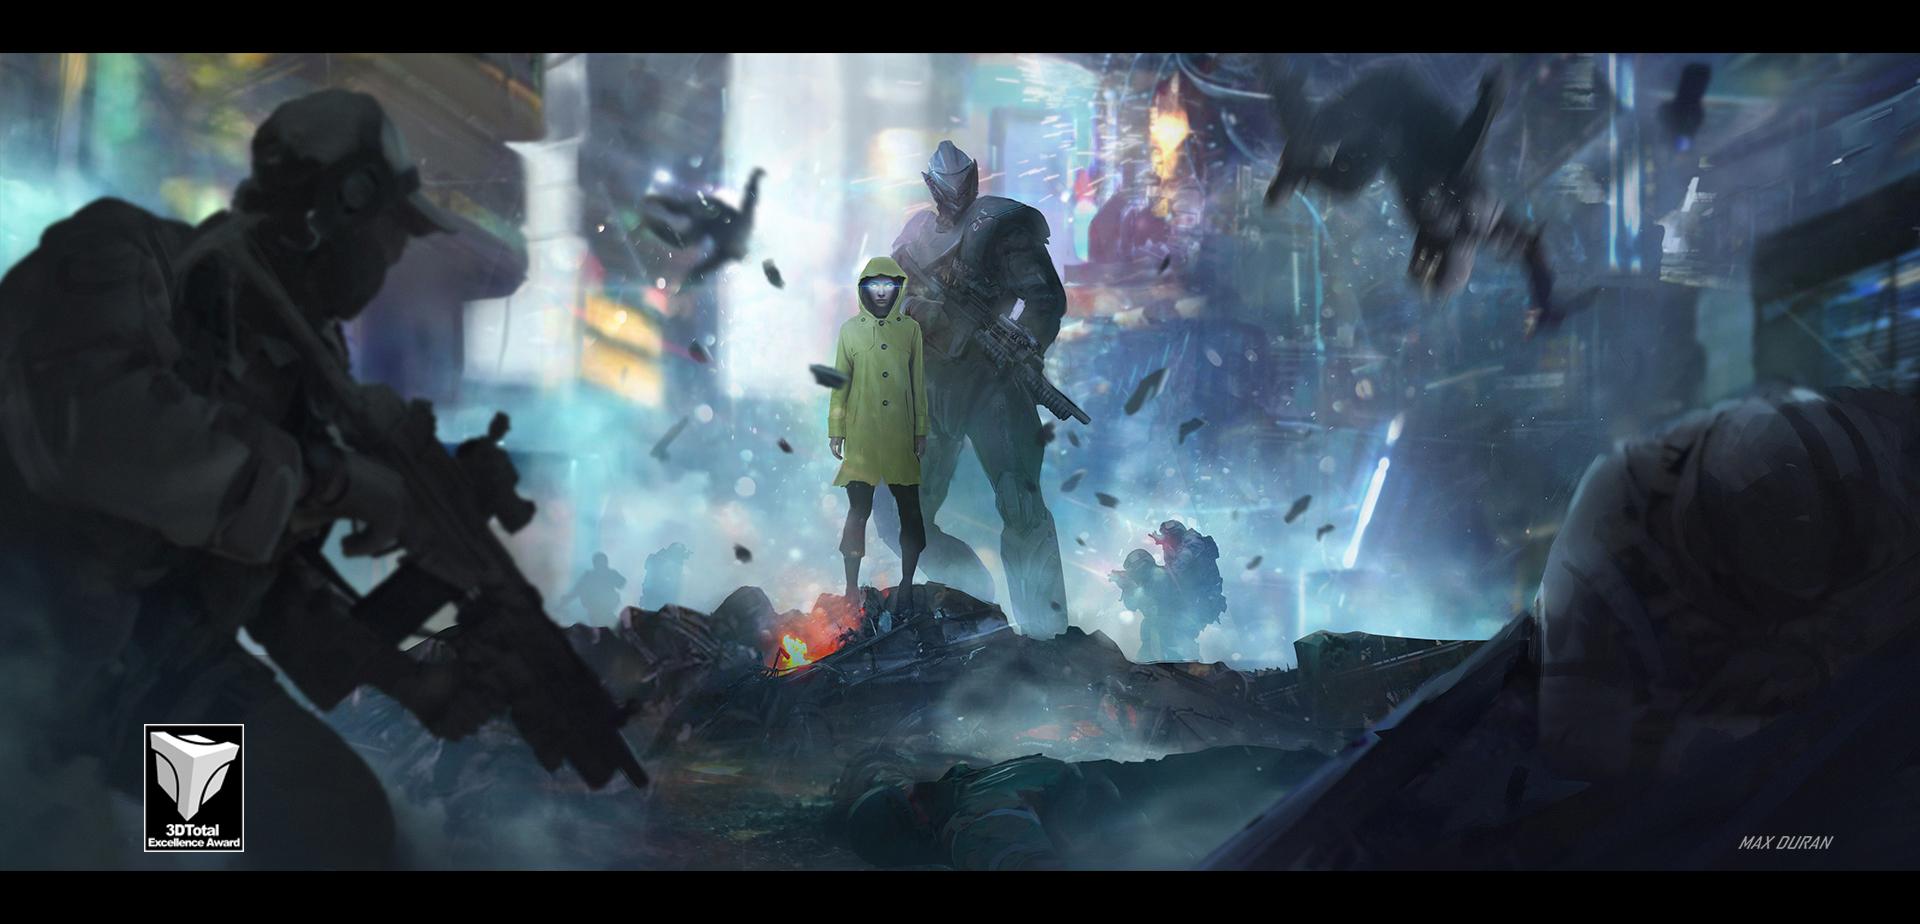 Beyond Human - Keyframe Concept Art #4